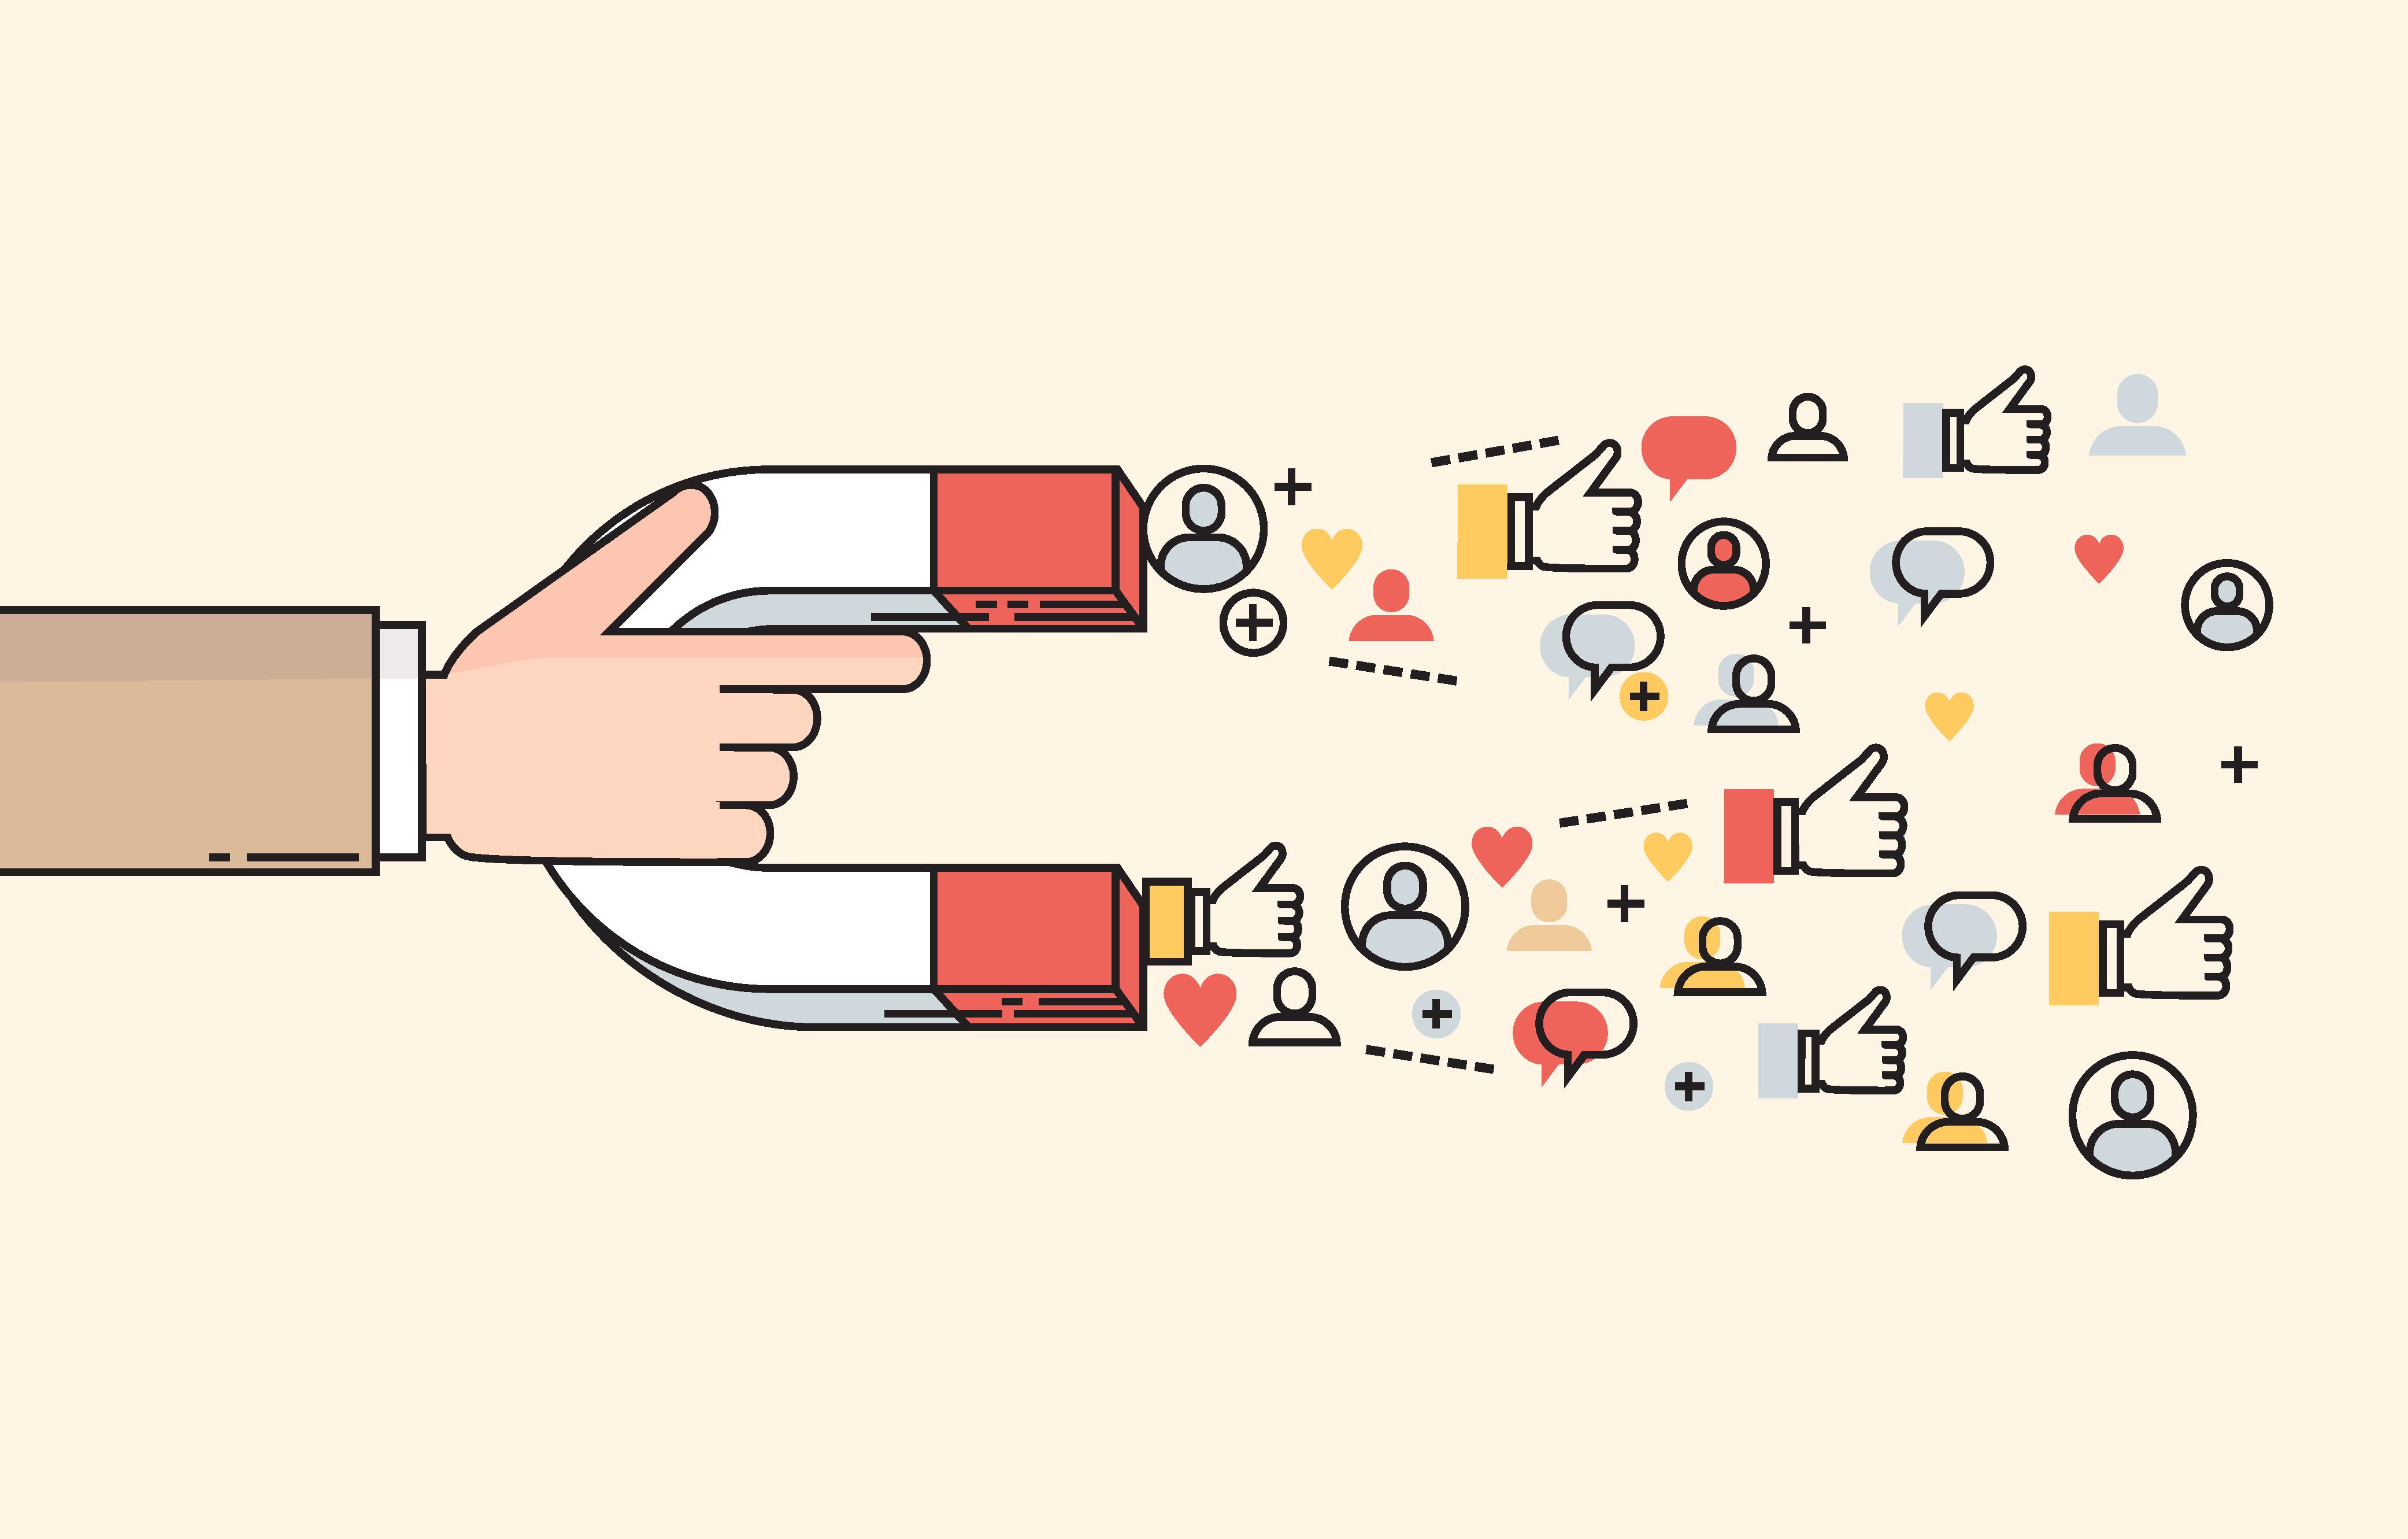 Here's how this entrepreneur bottled and monetised influencer marketing